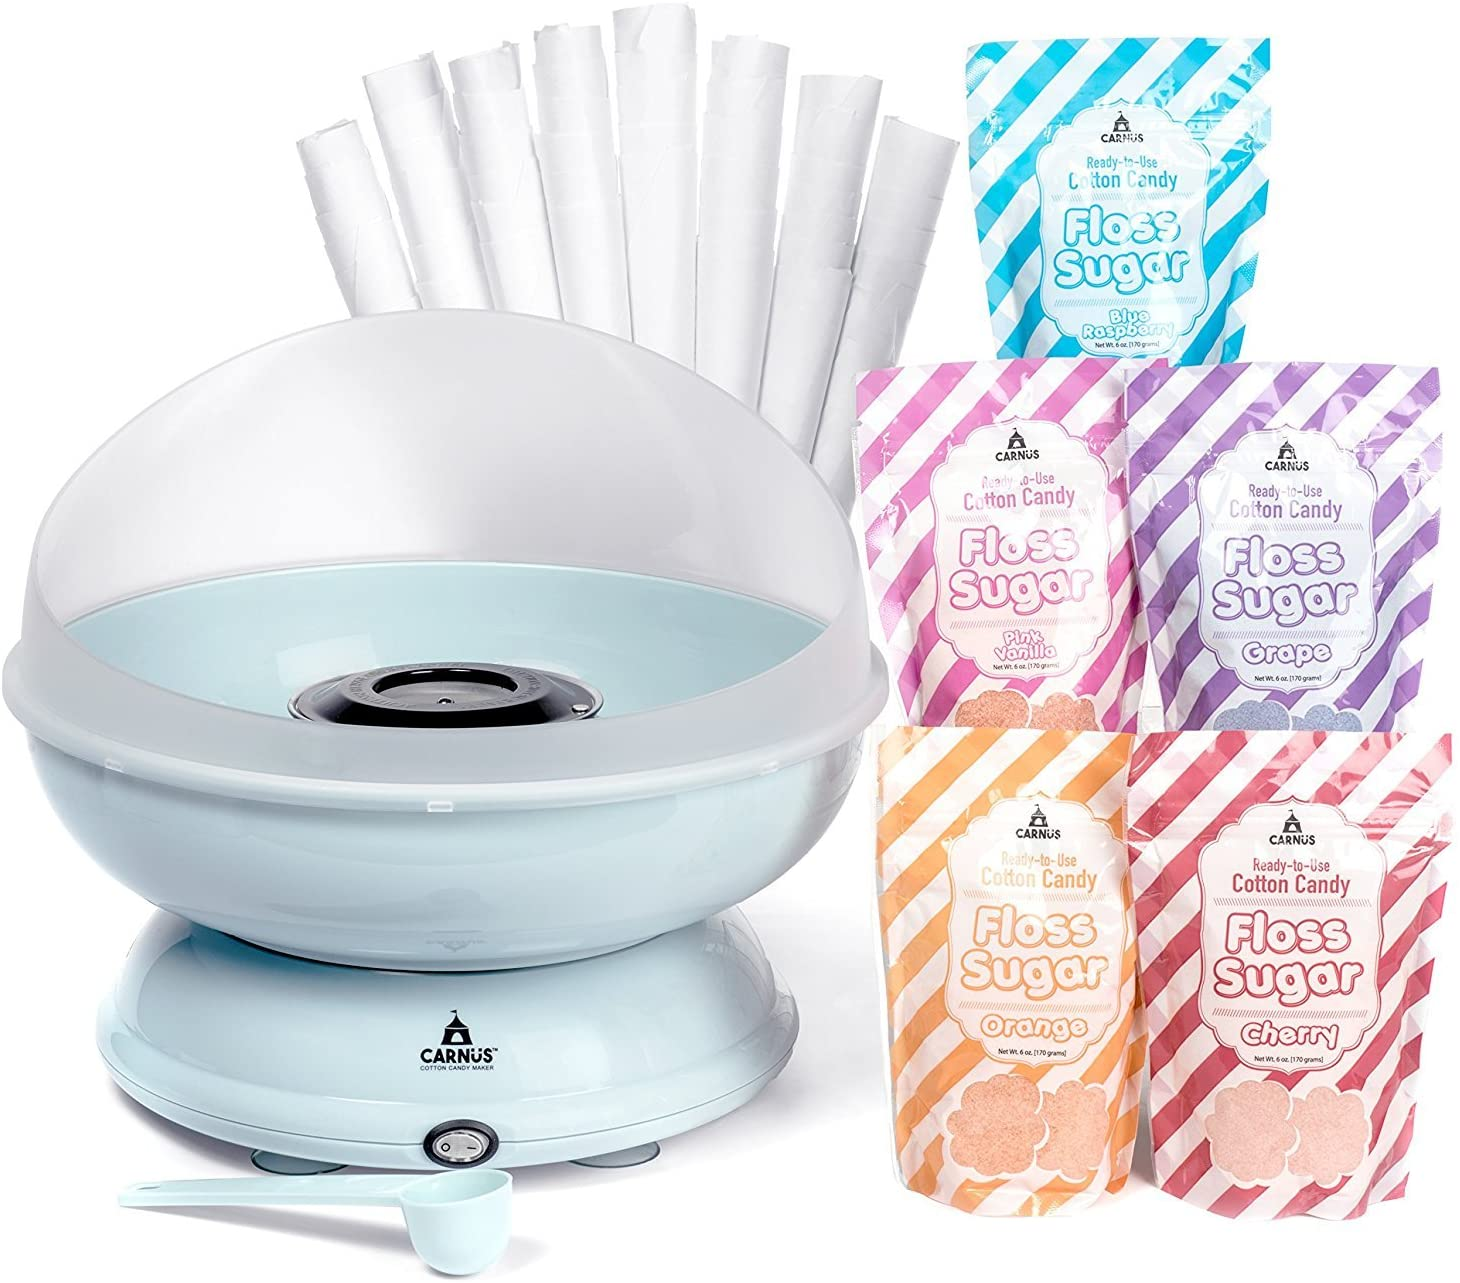 Carnus CN1000-S Cotton Candy Maker, 5 Sugar Packs